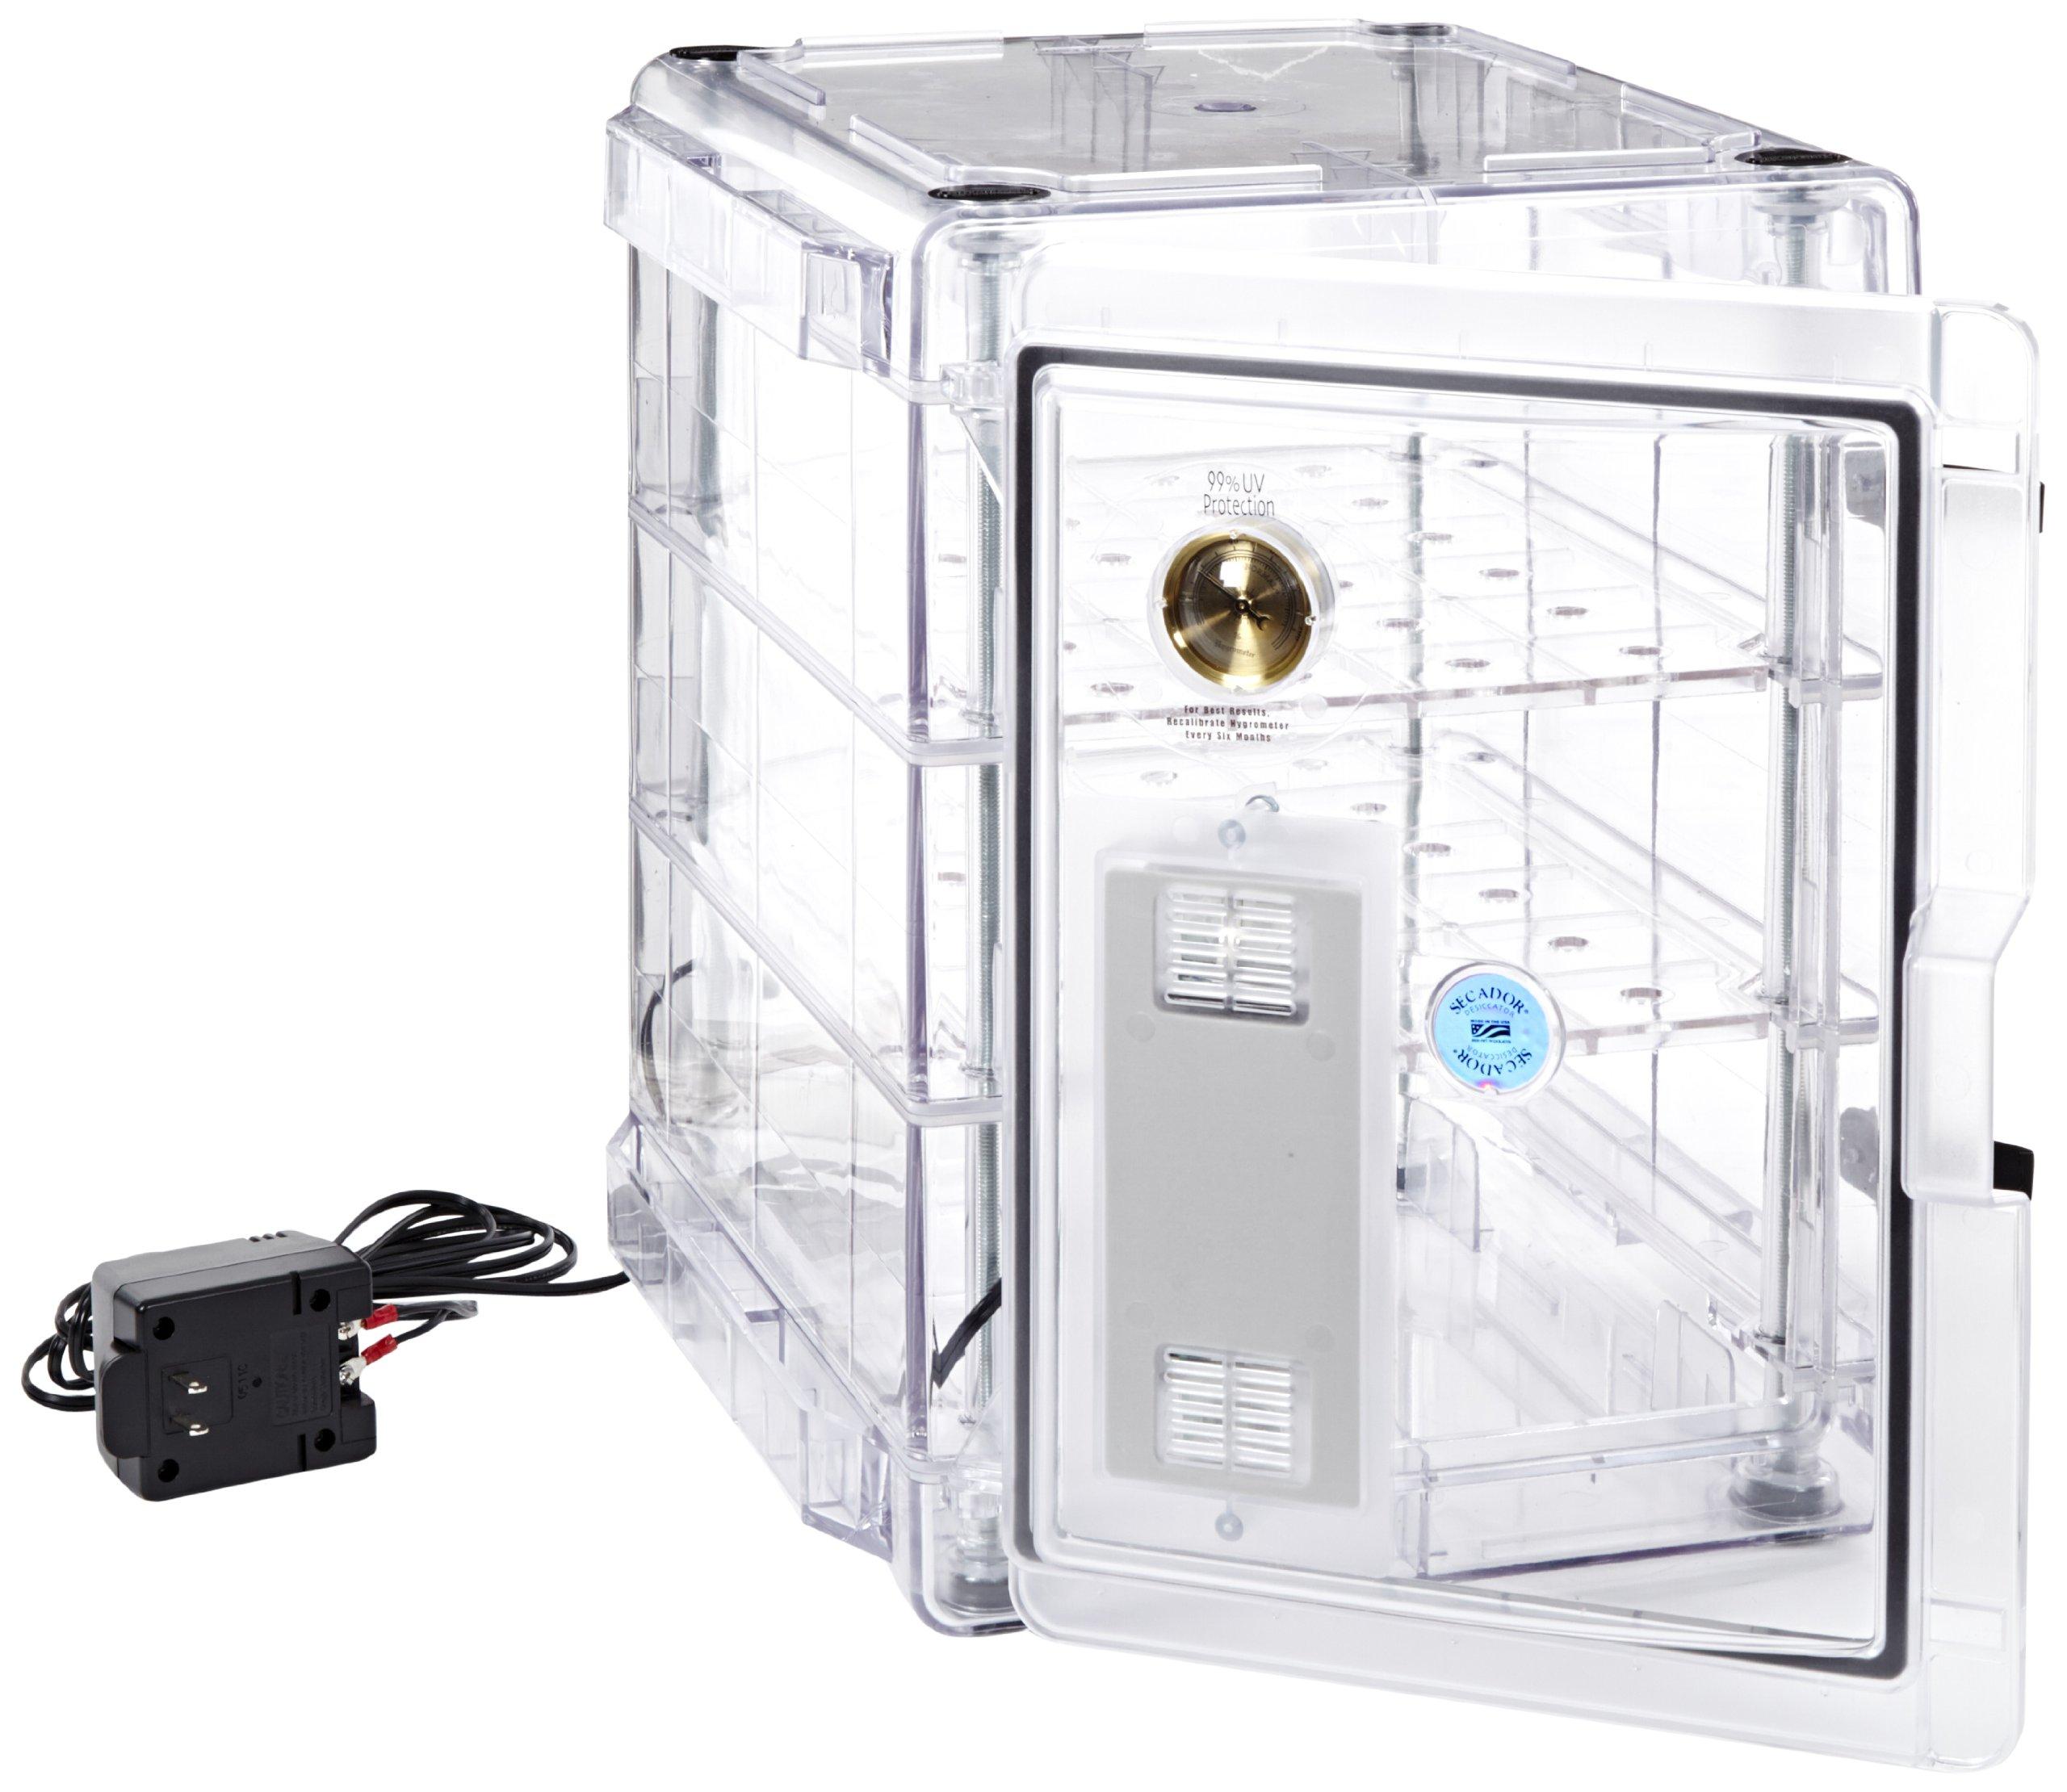 Bel-Art Secador Clear 3.0 Auto-Desiccator Cabinet; 120V, 1.6 cu. ft. (F42073-1115)